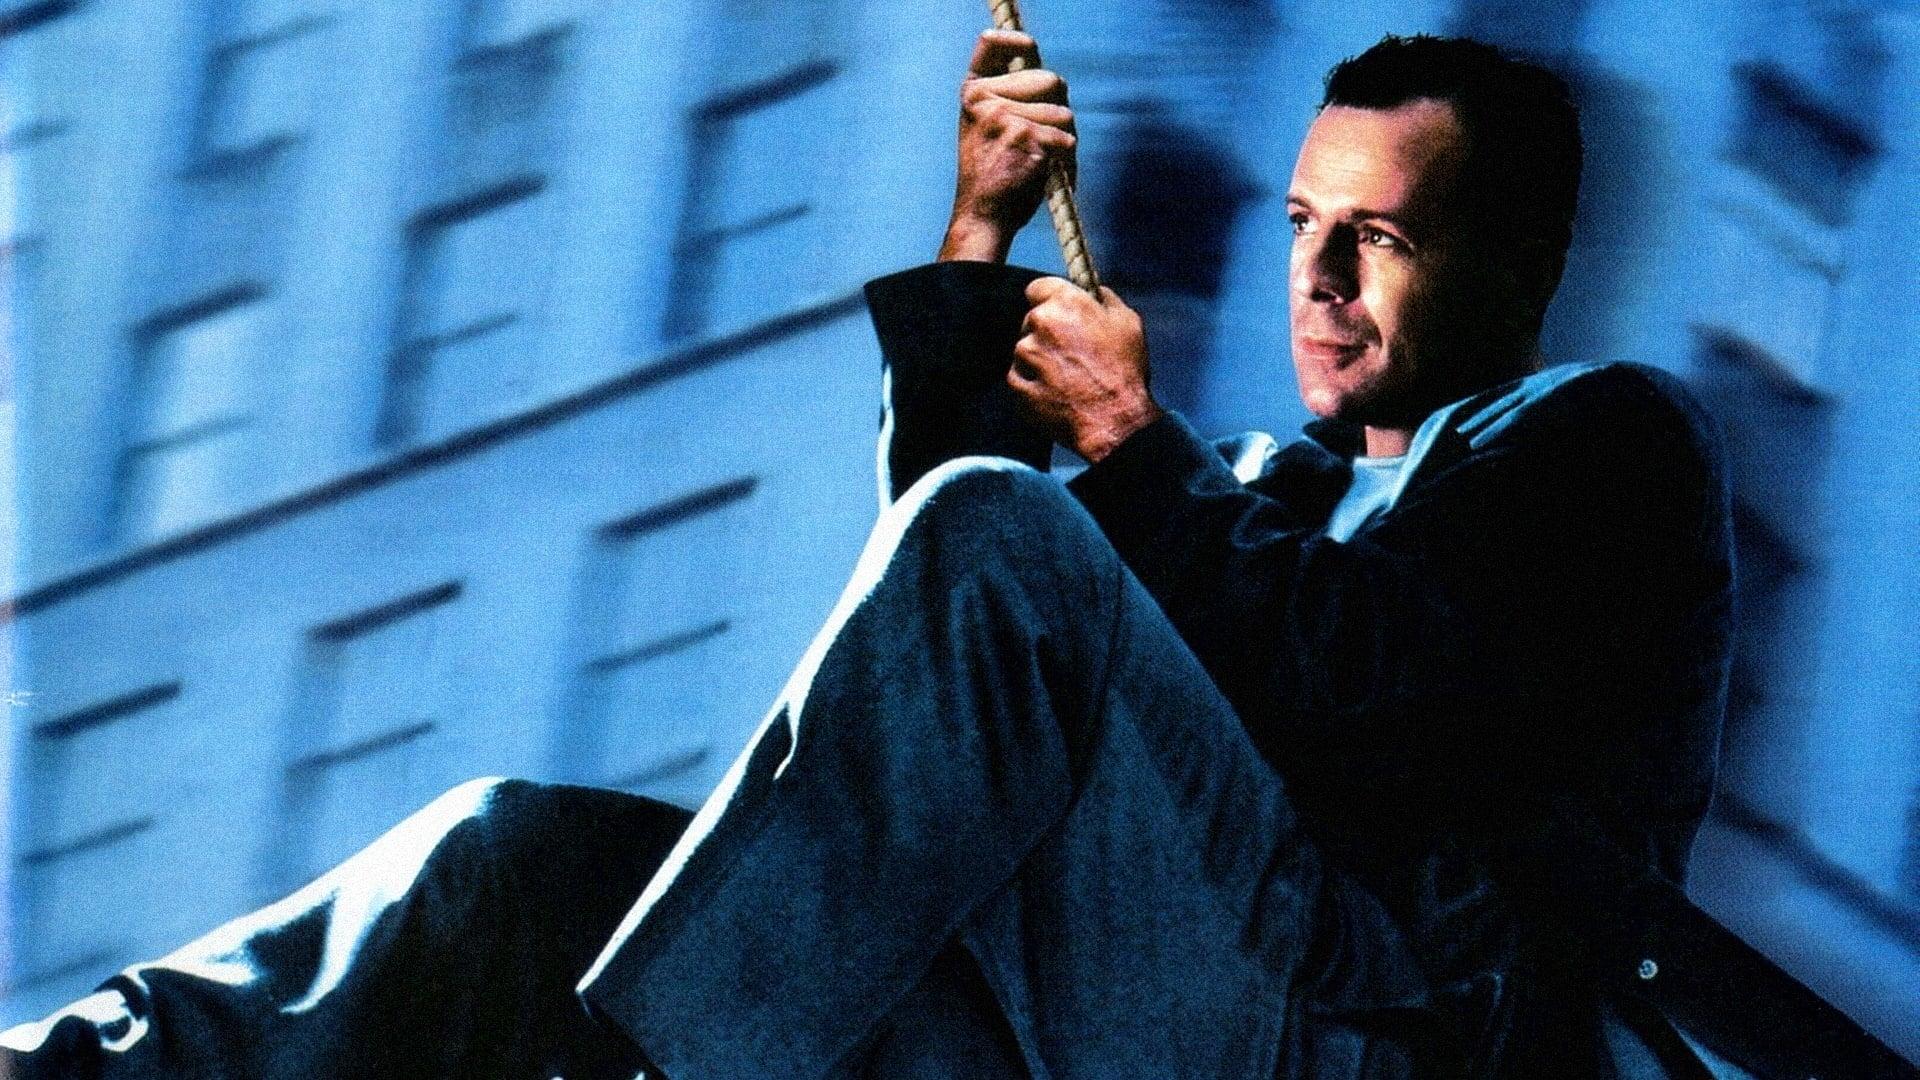 Hudson Hawk, Gentleman et cambrioleur (1991)